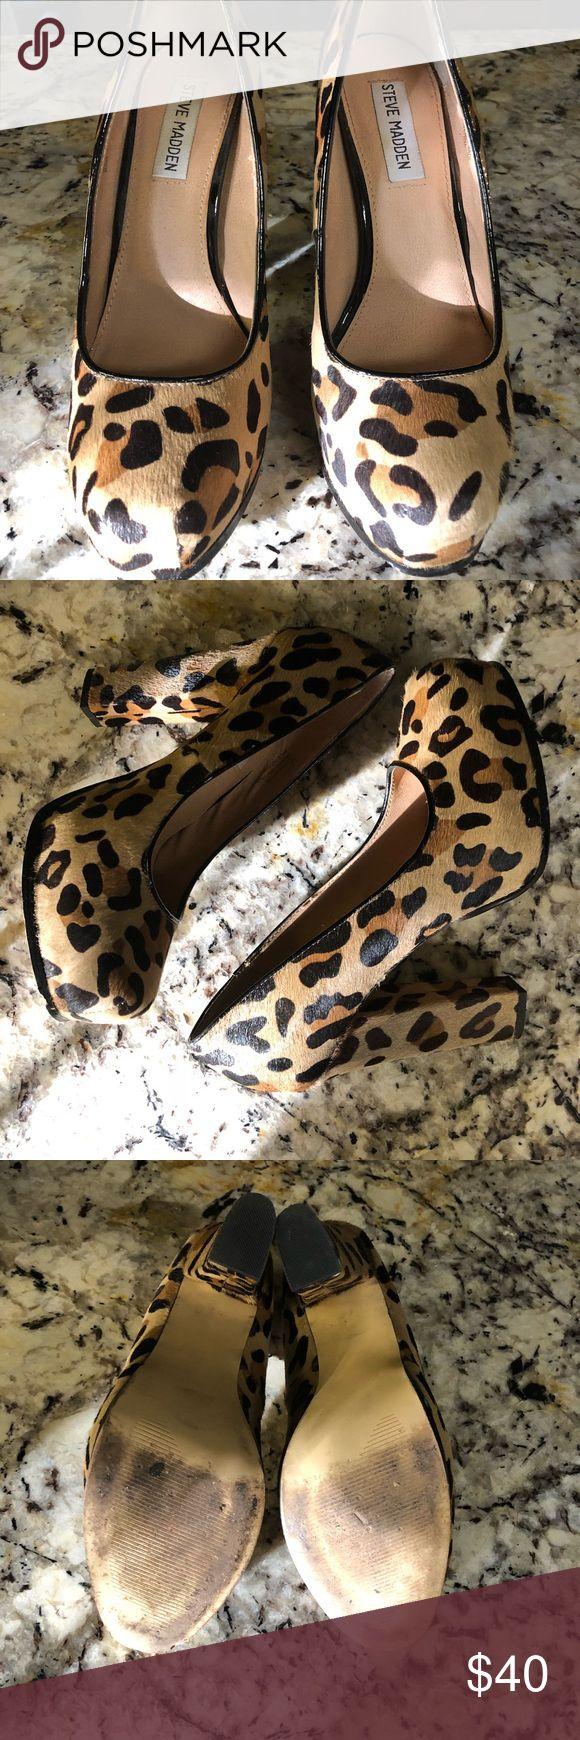 Steve Madden leopard cheetah print hair platform Animal print high heels, platform, block heel. Worn a couple of times. Leather Steve Madden Shoes Platforms